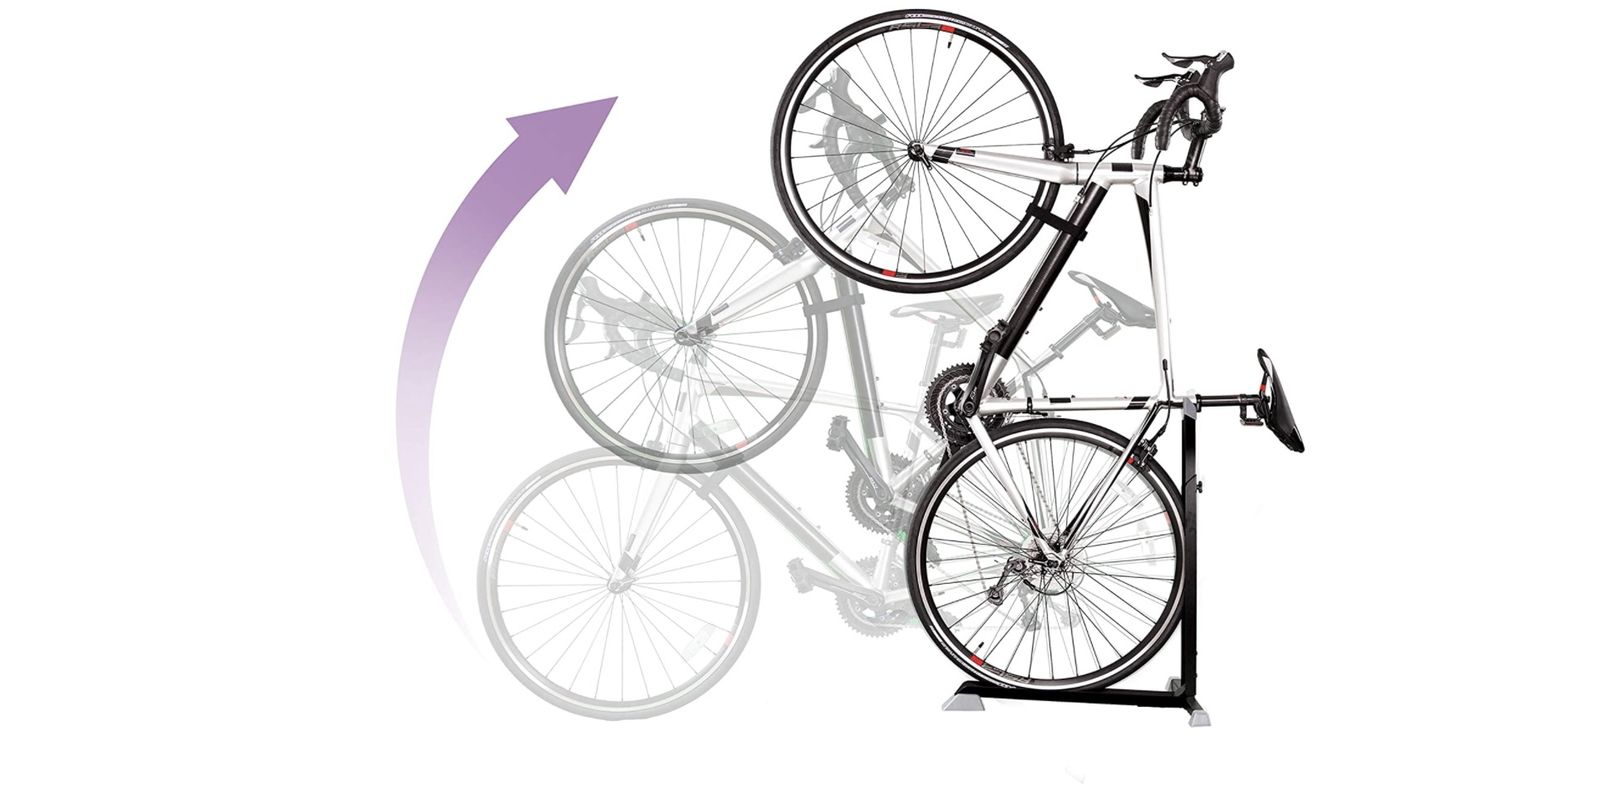 Bike Nook Bicycle Stand - best bike storage